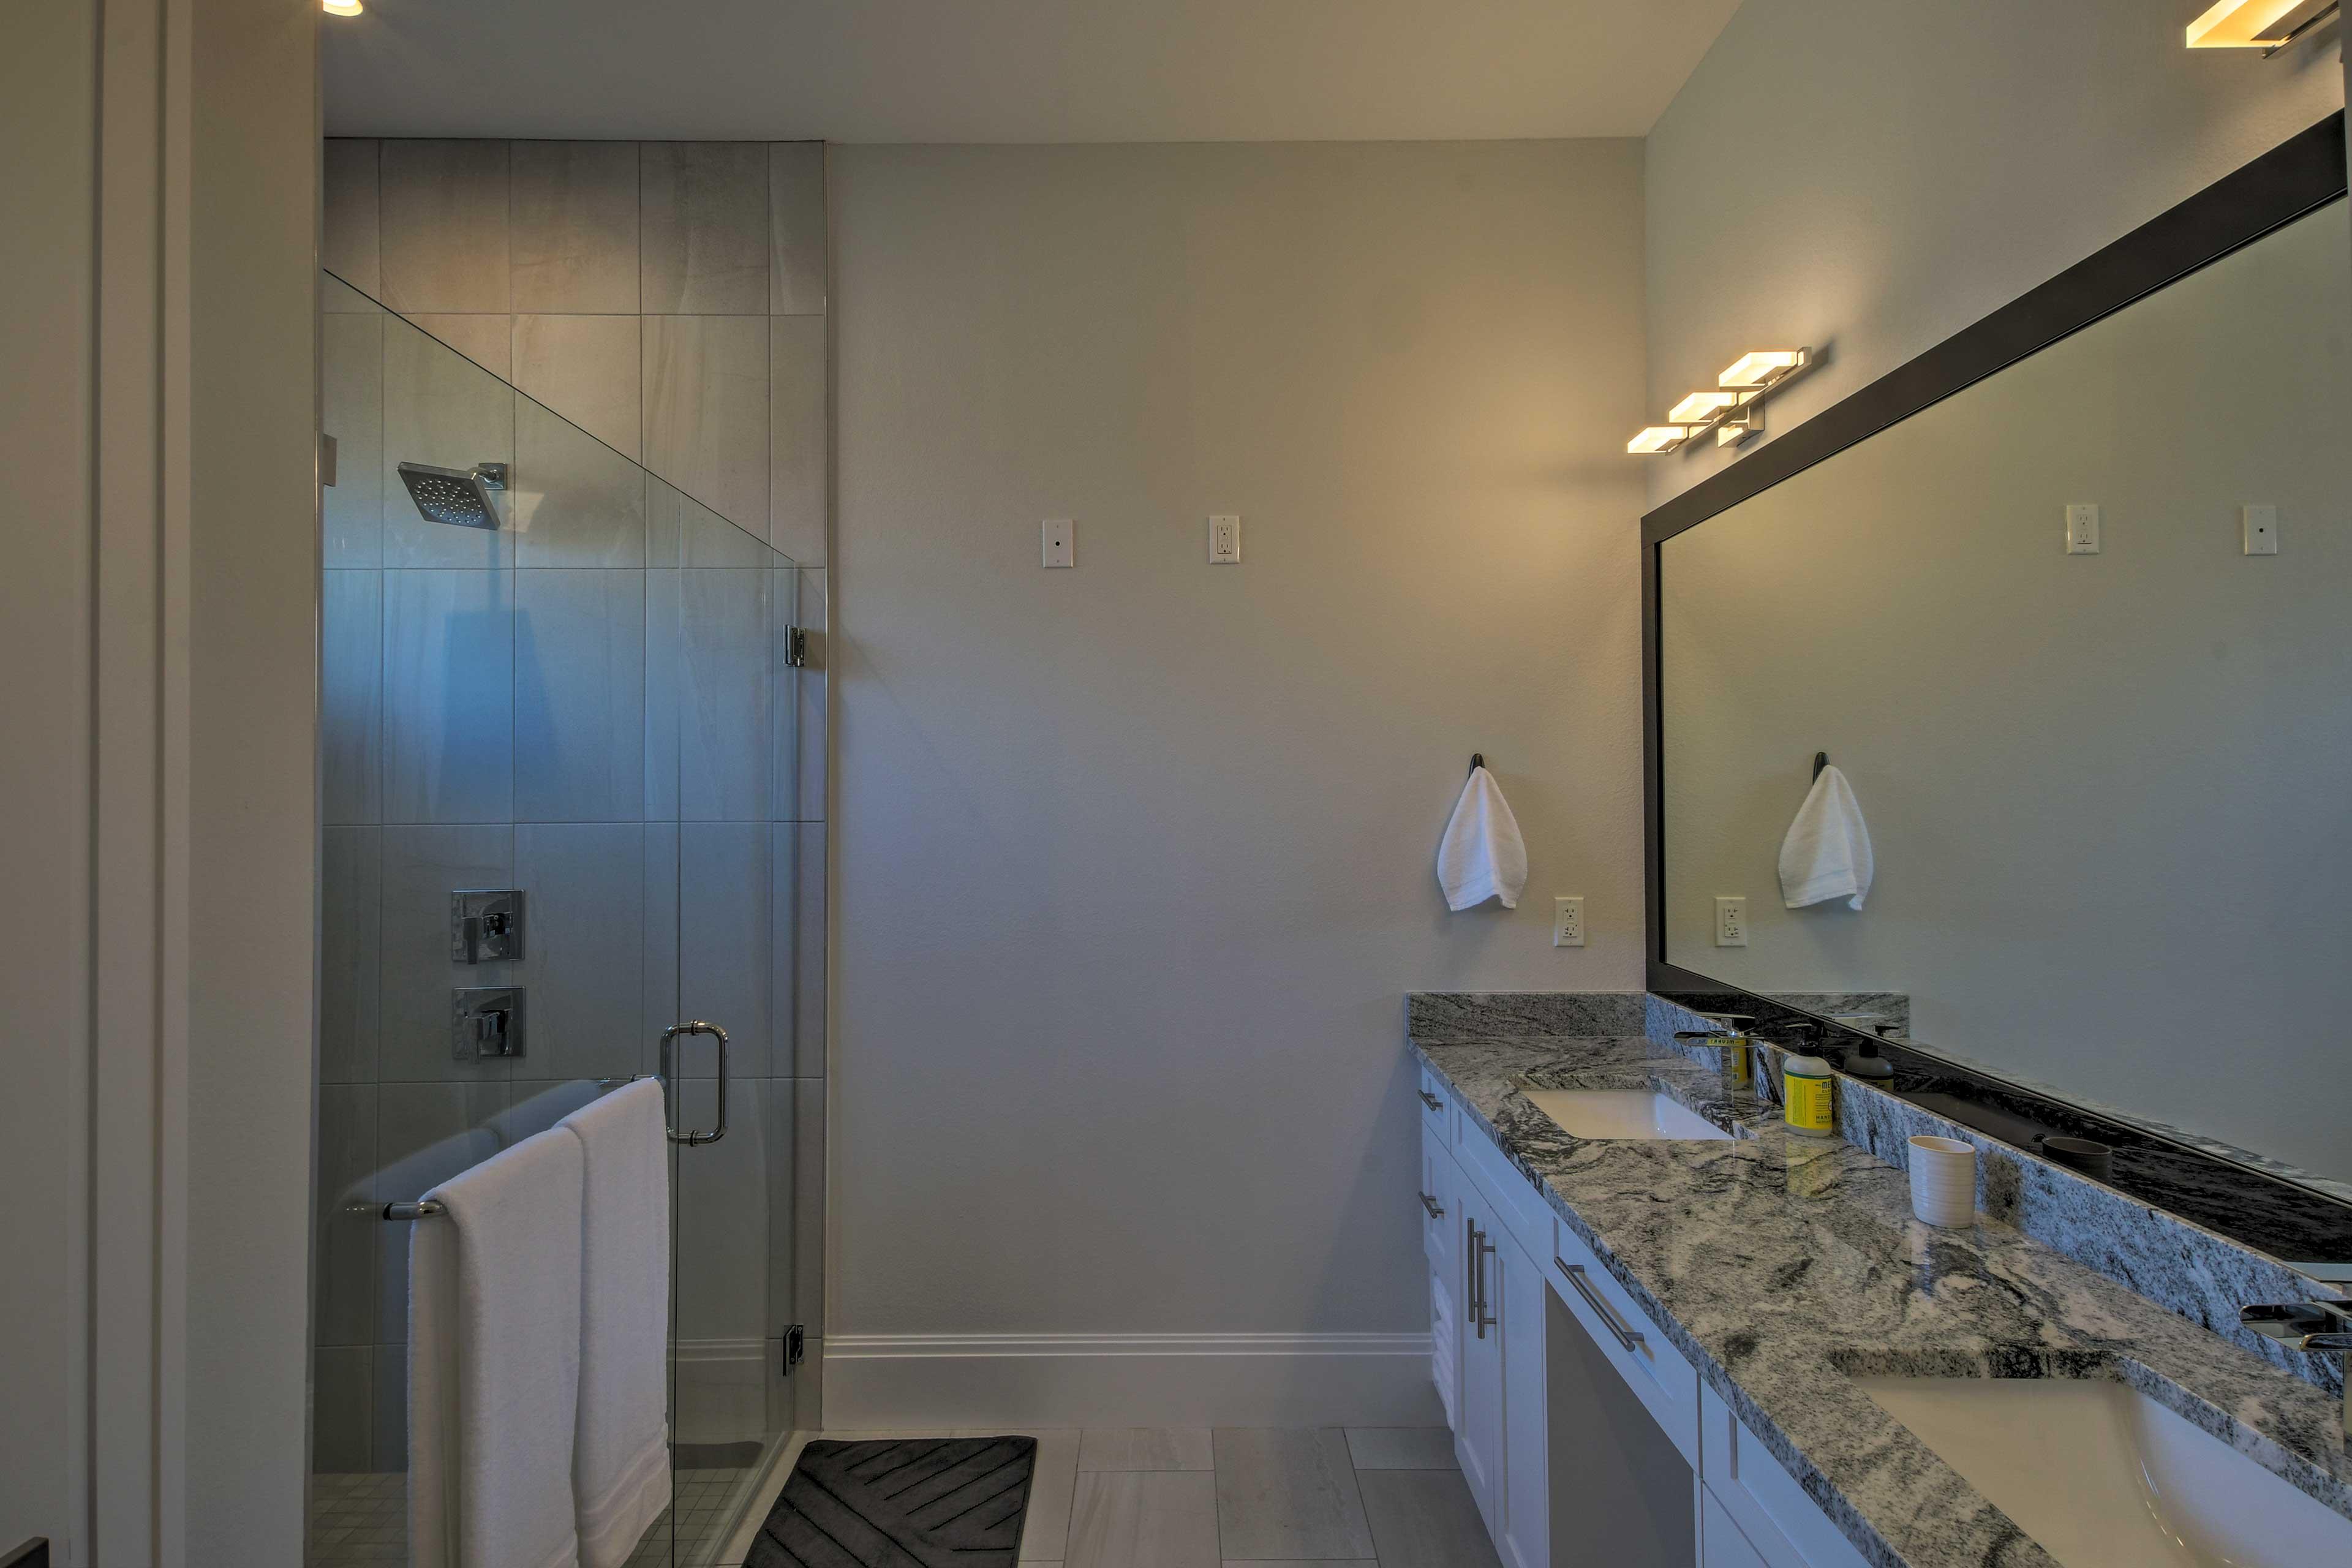 Rinse off in the pristine en-suite bathroom.